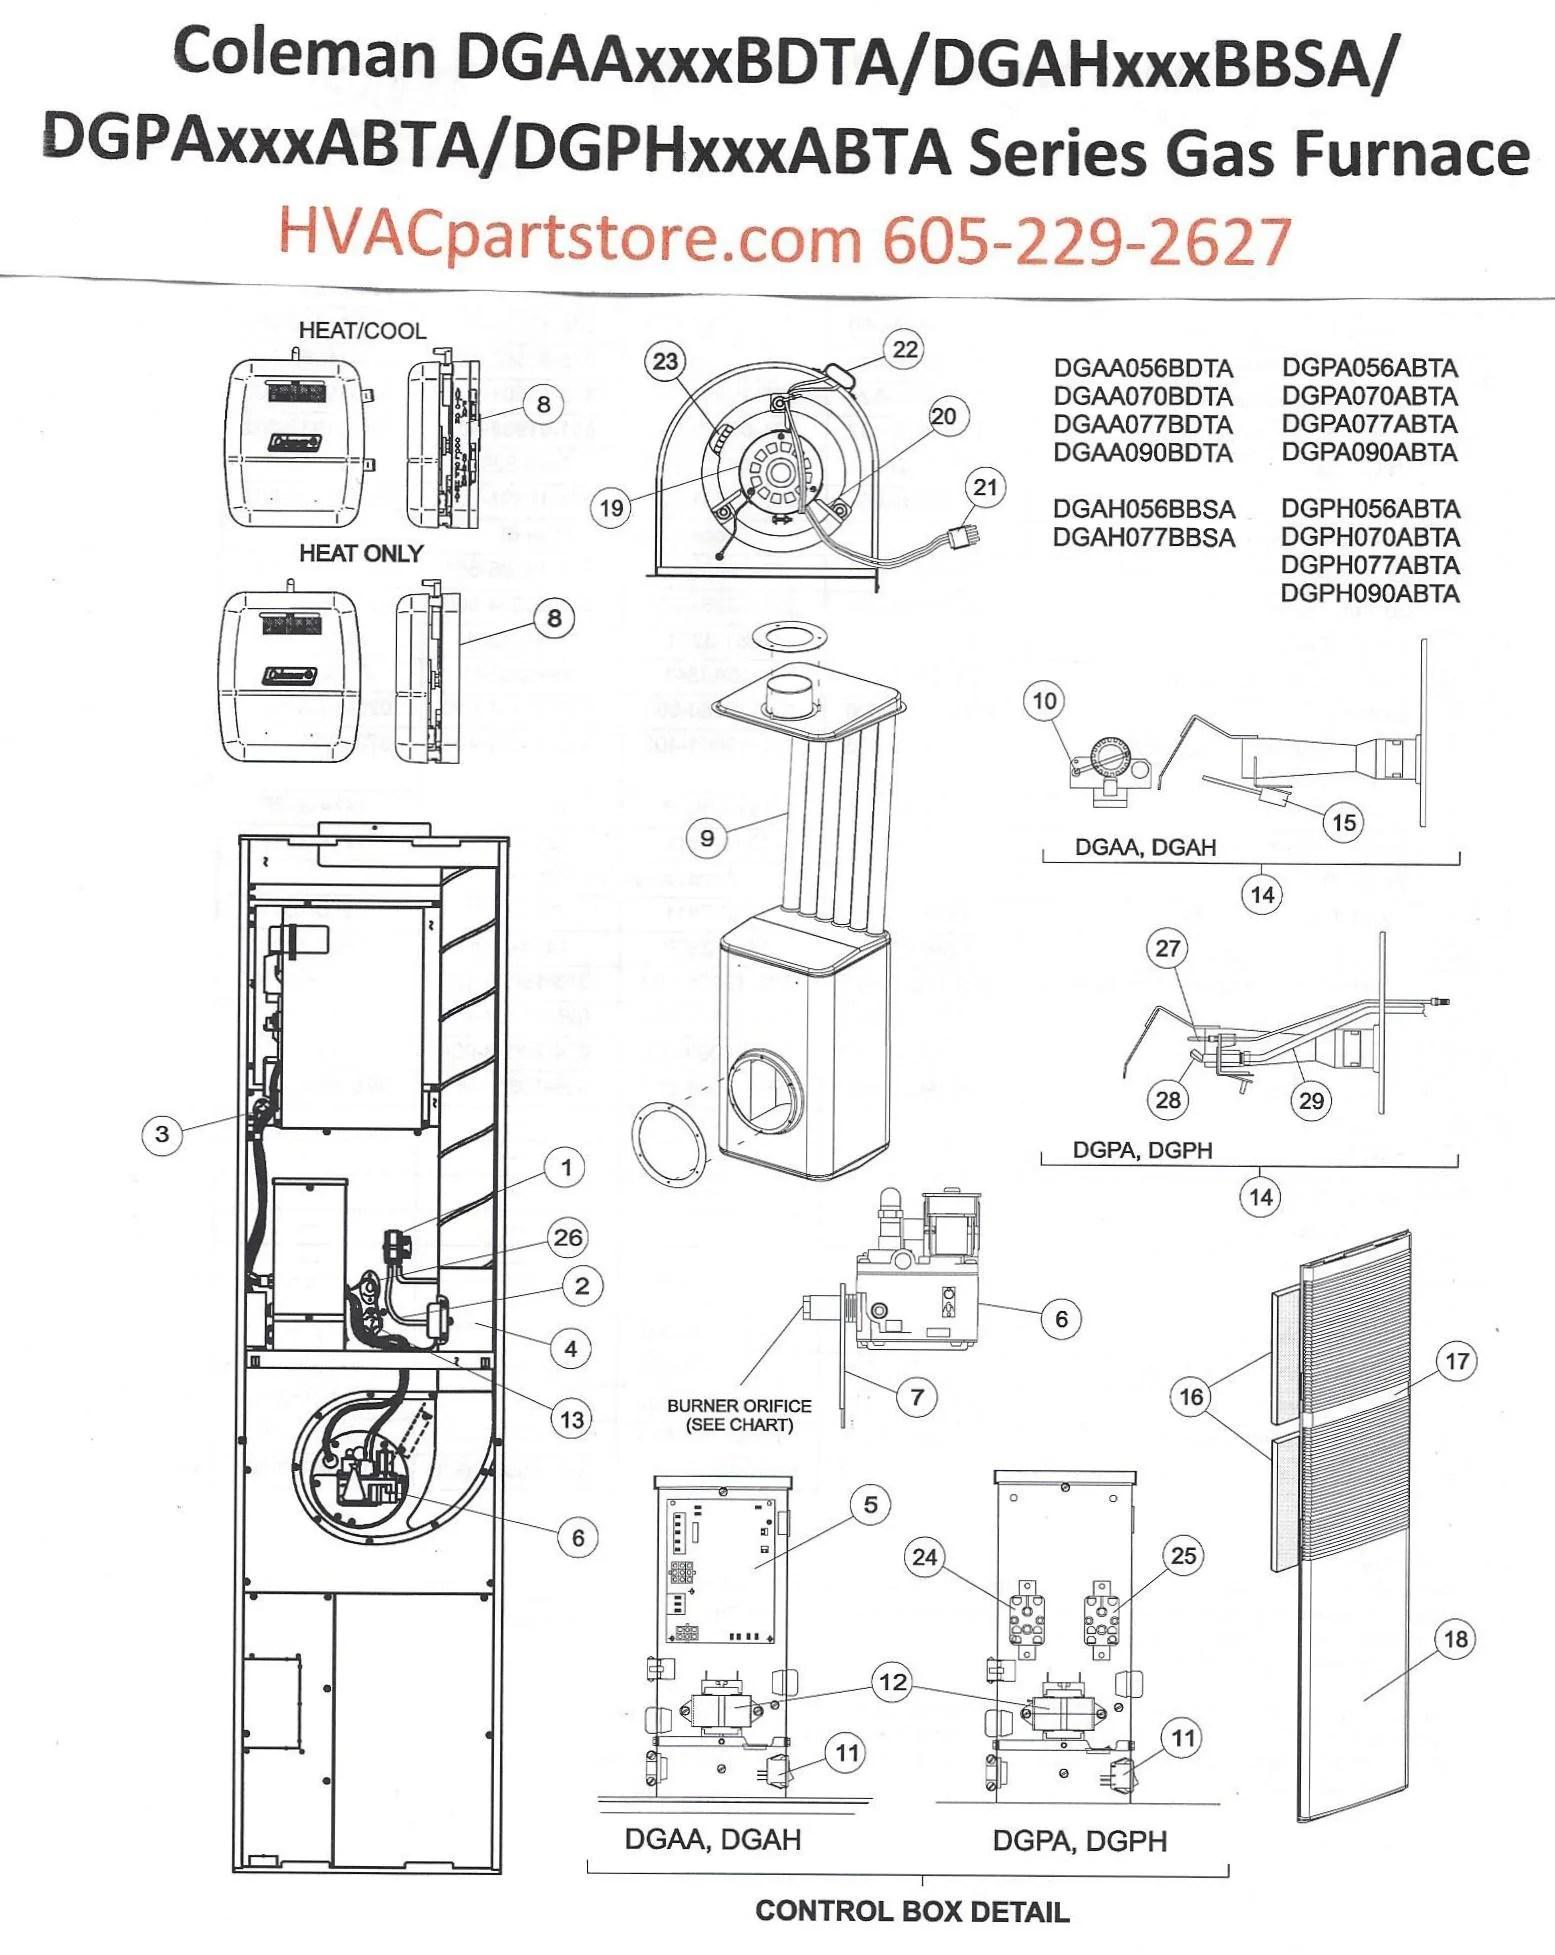 wiring diagrams for nordyne furnaces gas furnace wiring electric furnace wiring diagrams e2eb 015hb electric furnace wiring diagrams e2eb 015hb [ 1555 x 1955 Pixel ]